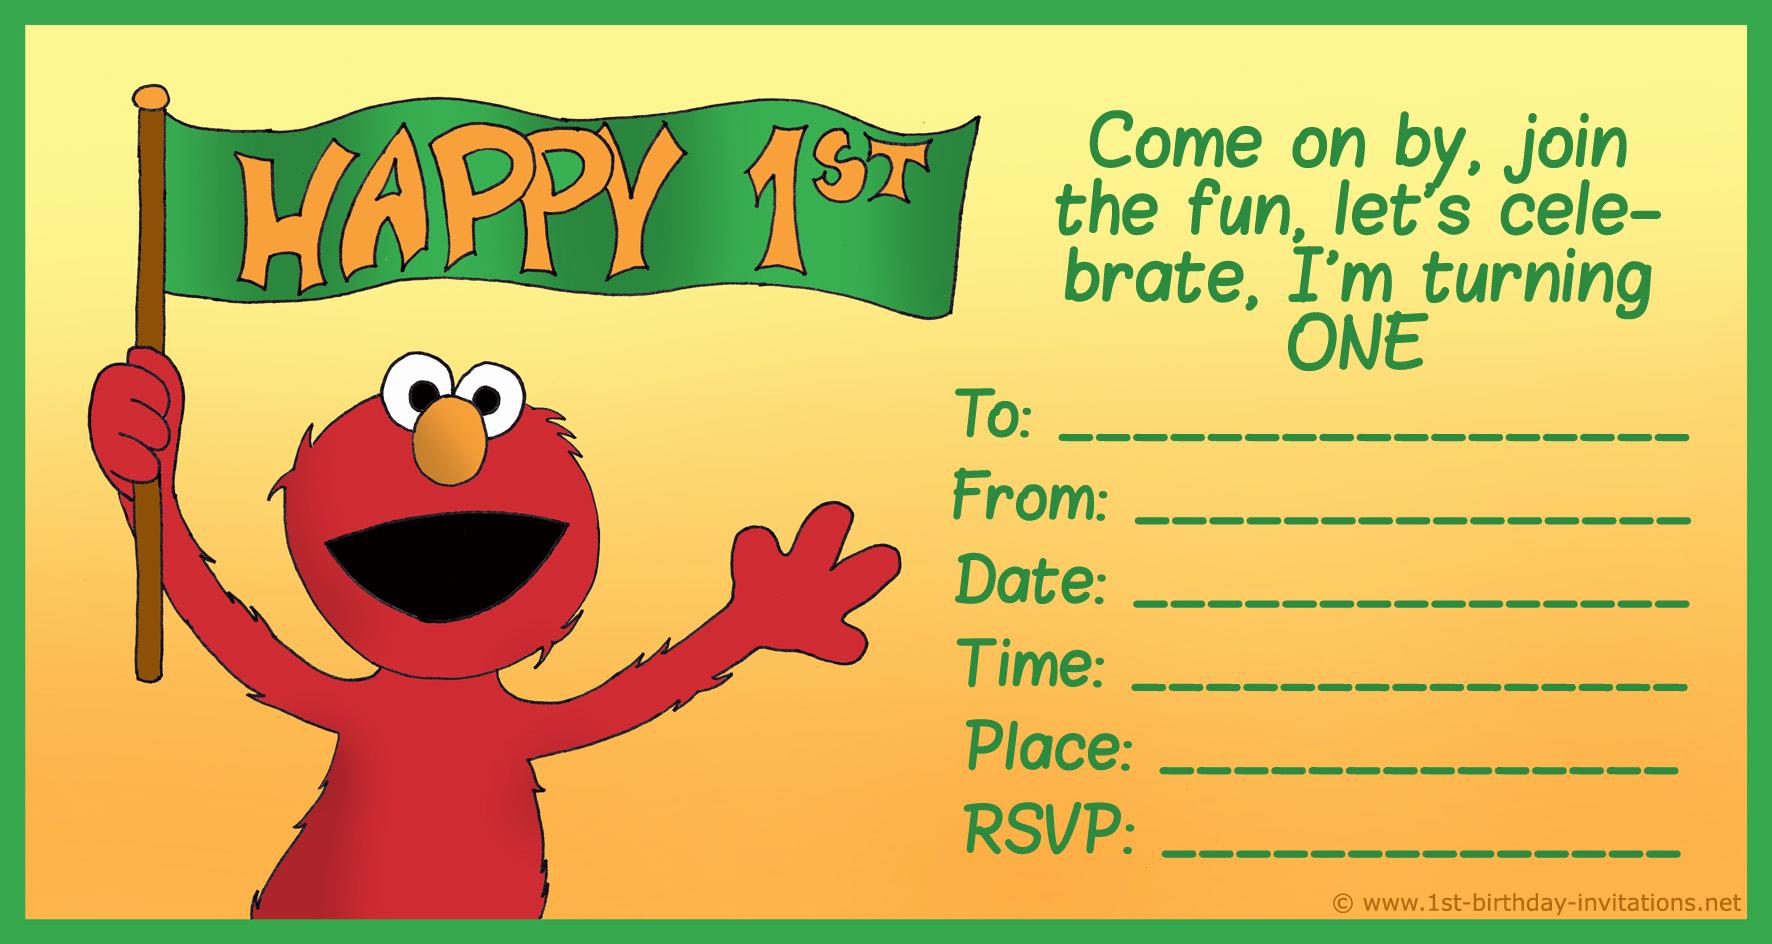 Elmo Birthday Invitation Template Unique Elmo Birthday Party Invitations Free Printable